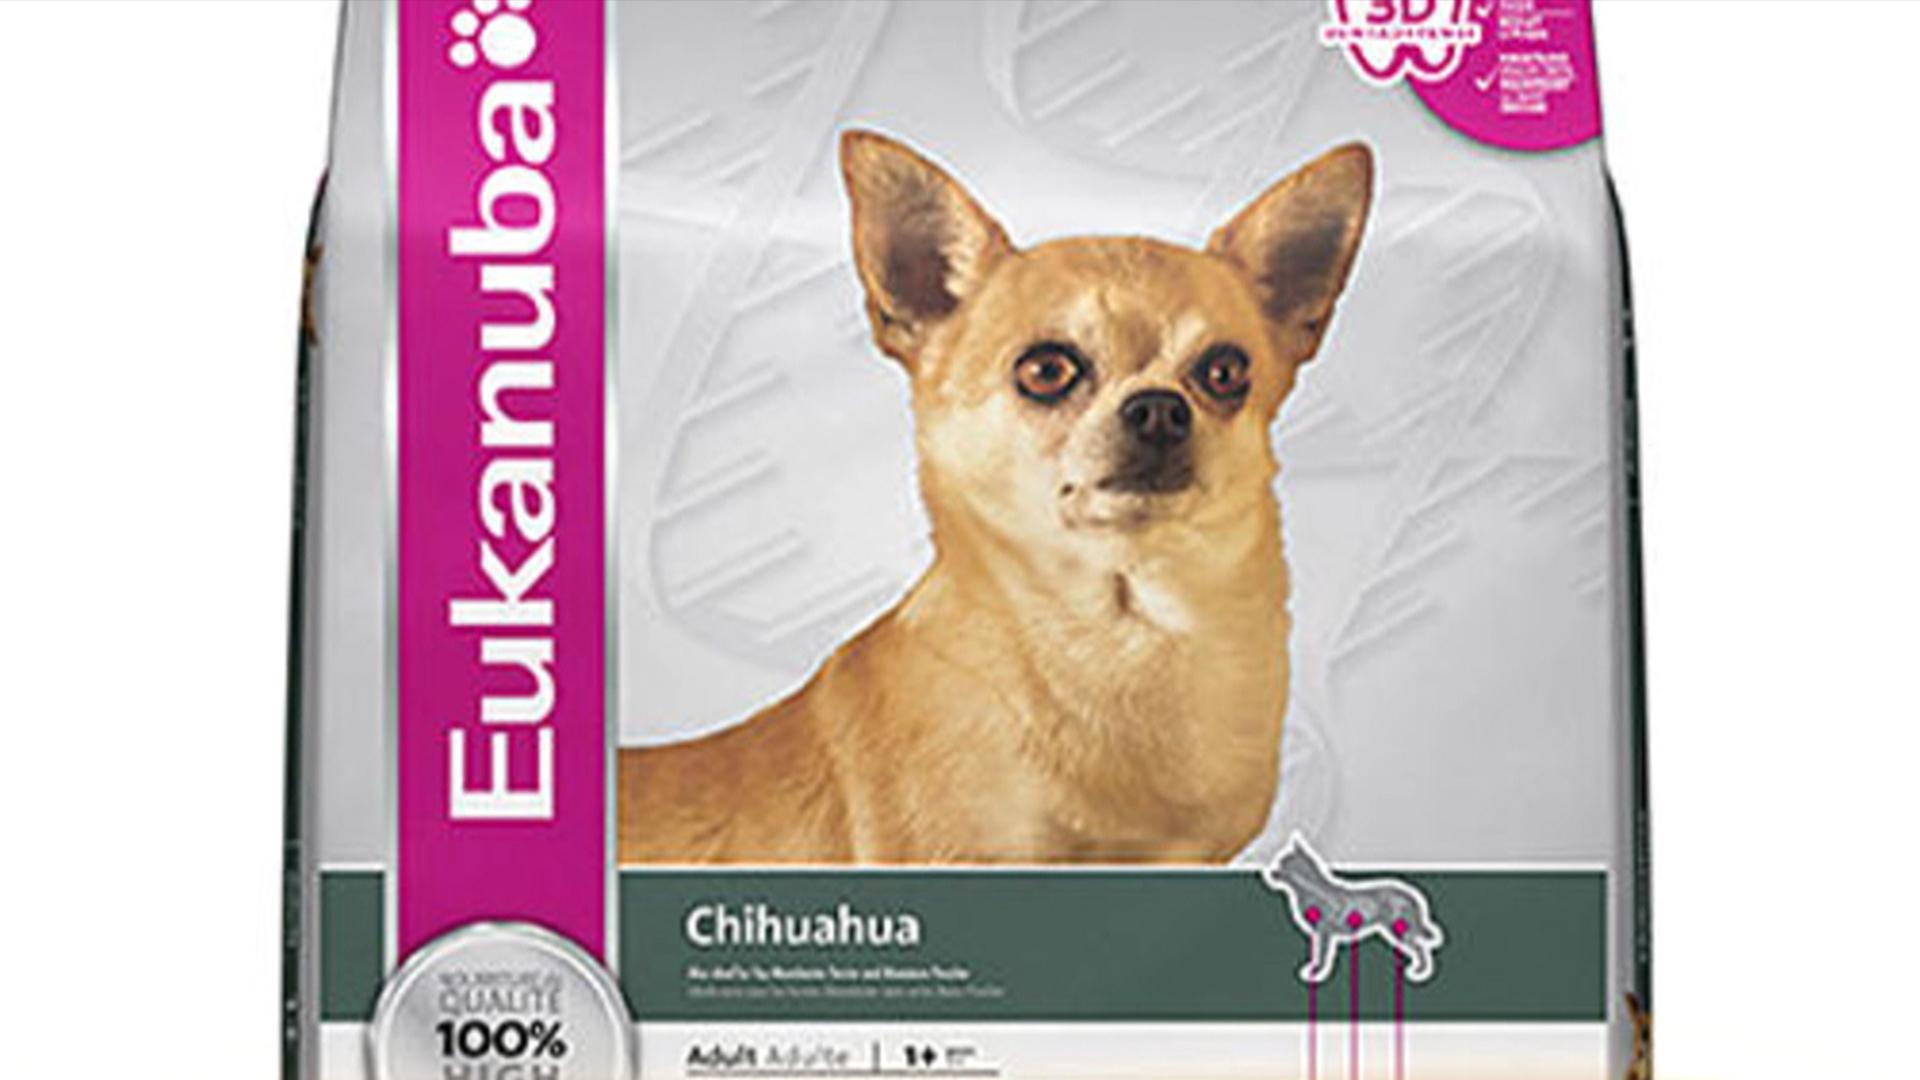 Eukanuba dry dog food